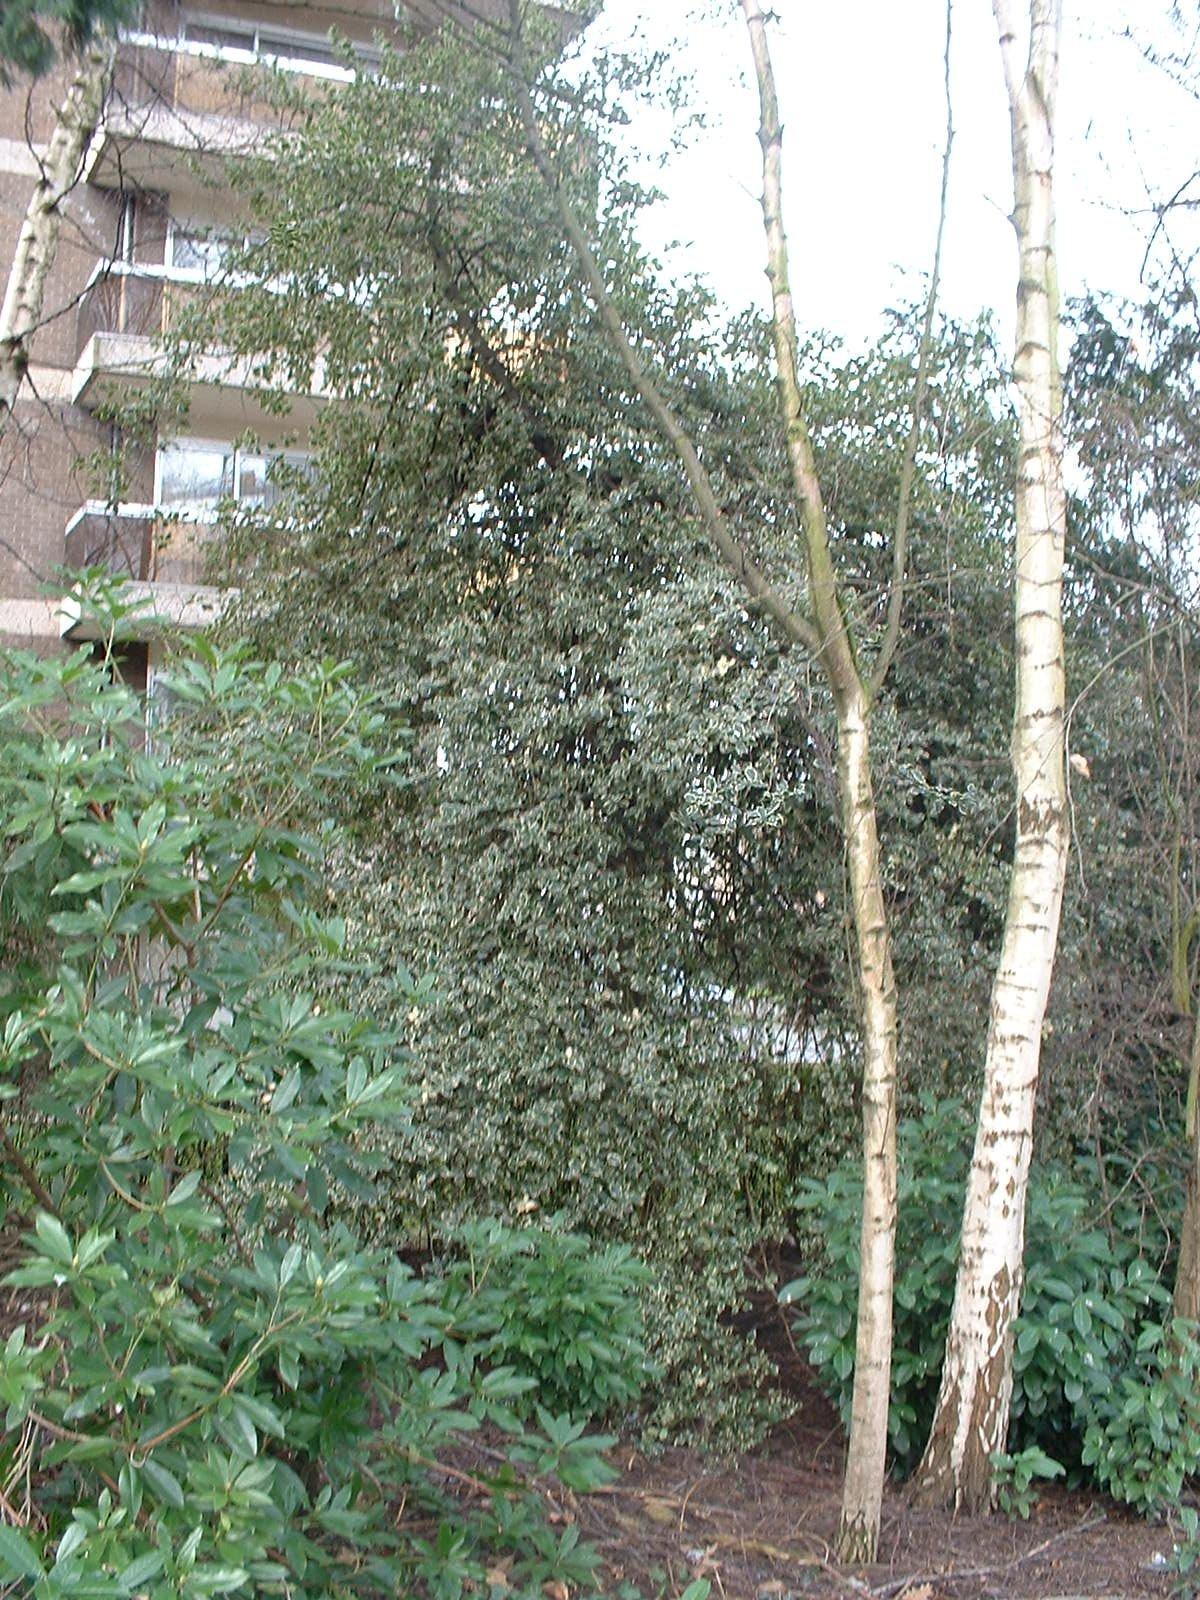 Ilex aquifolium 'Albomarginata' – Anderlecht, Propriété rue de la Laiterie, Rue de la Laiterie, 57 –  04 Mars 2003